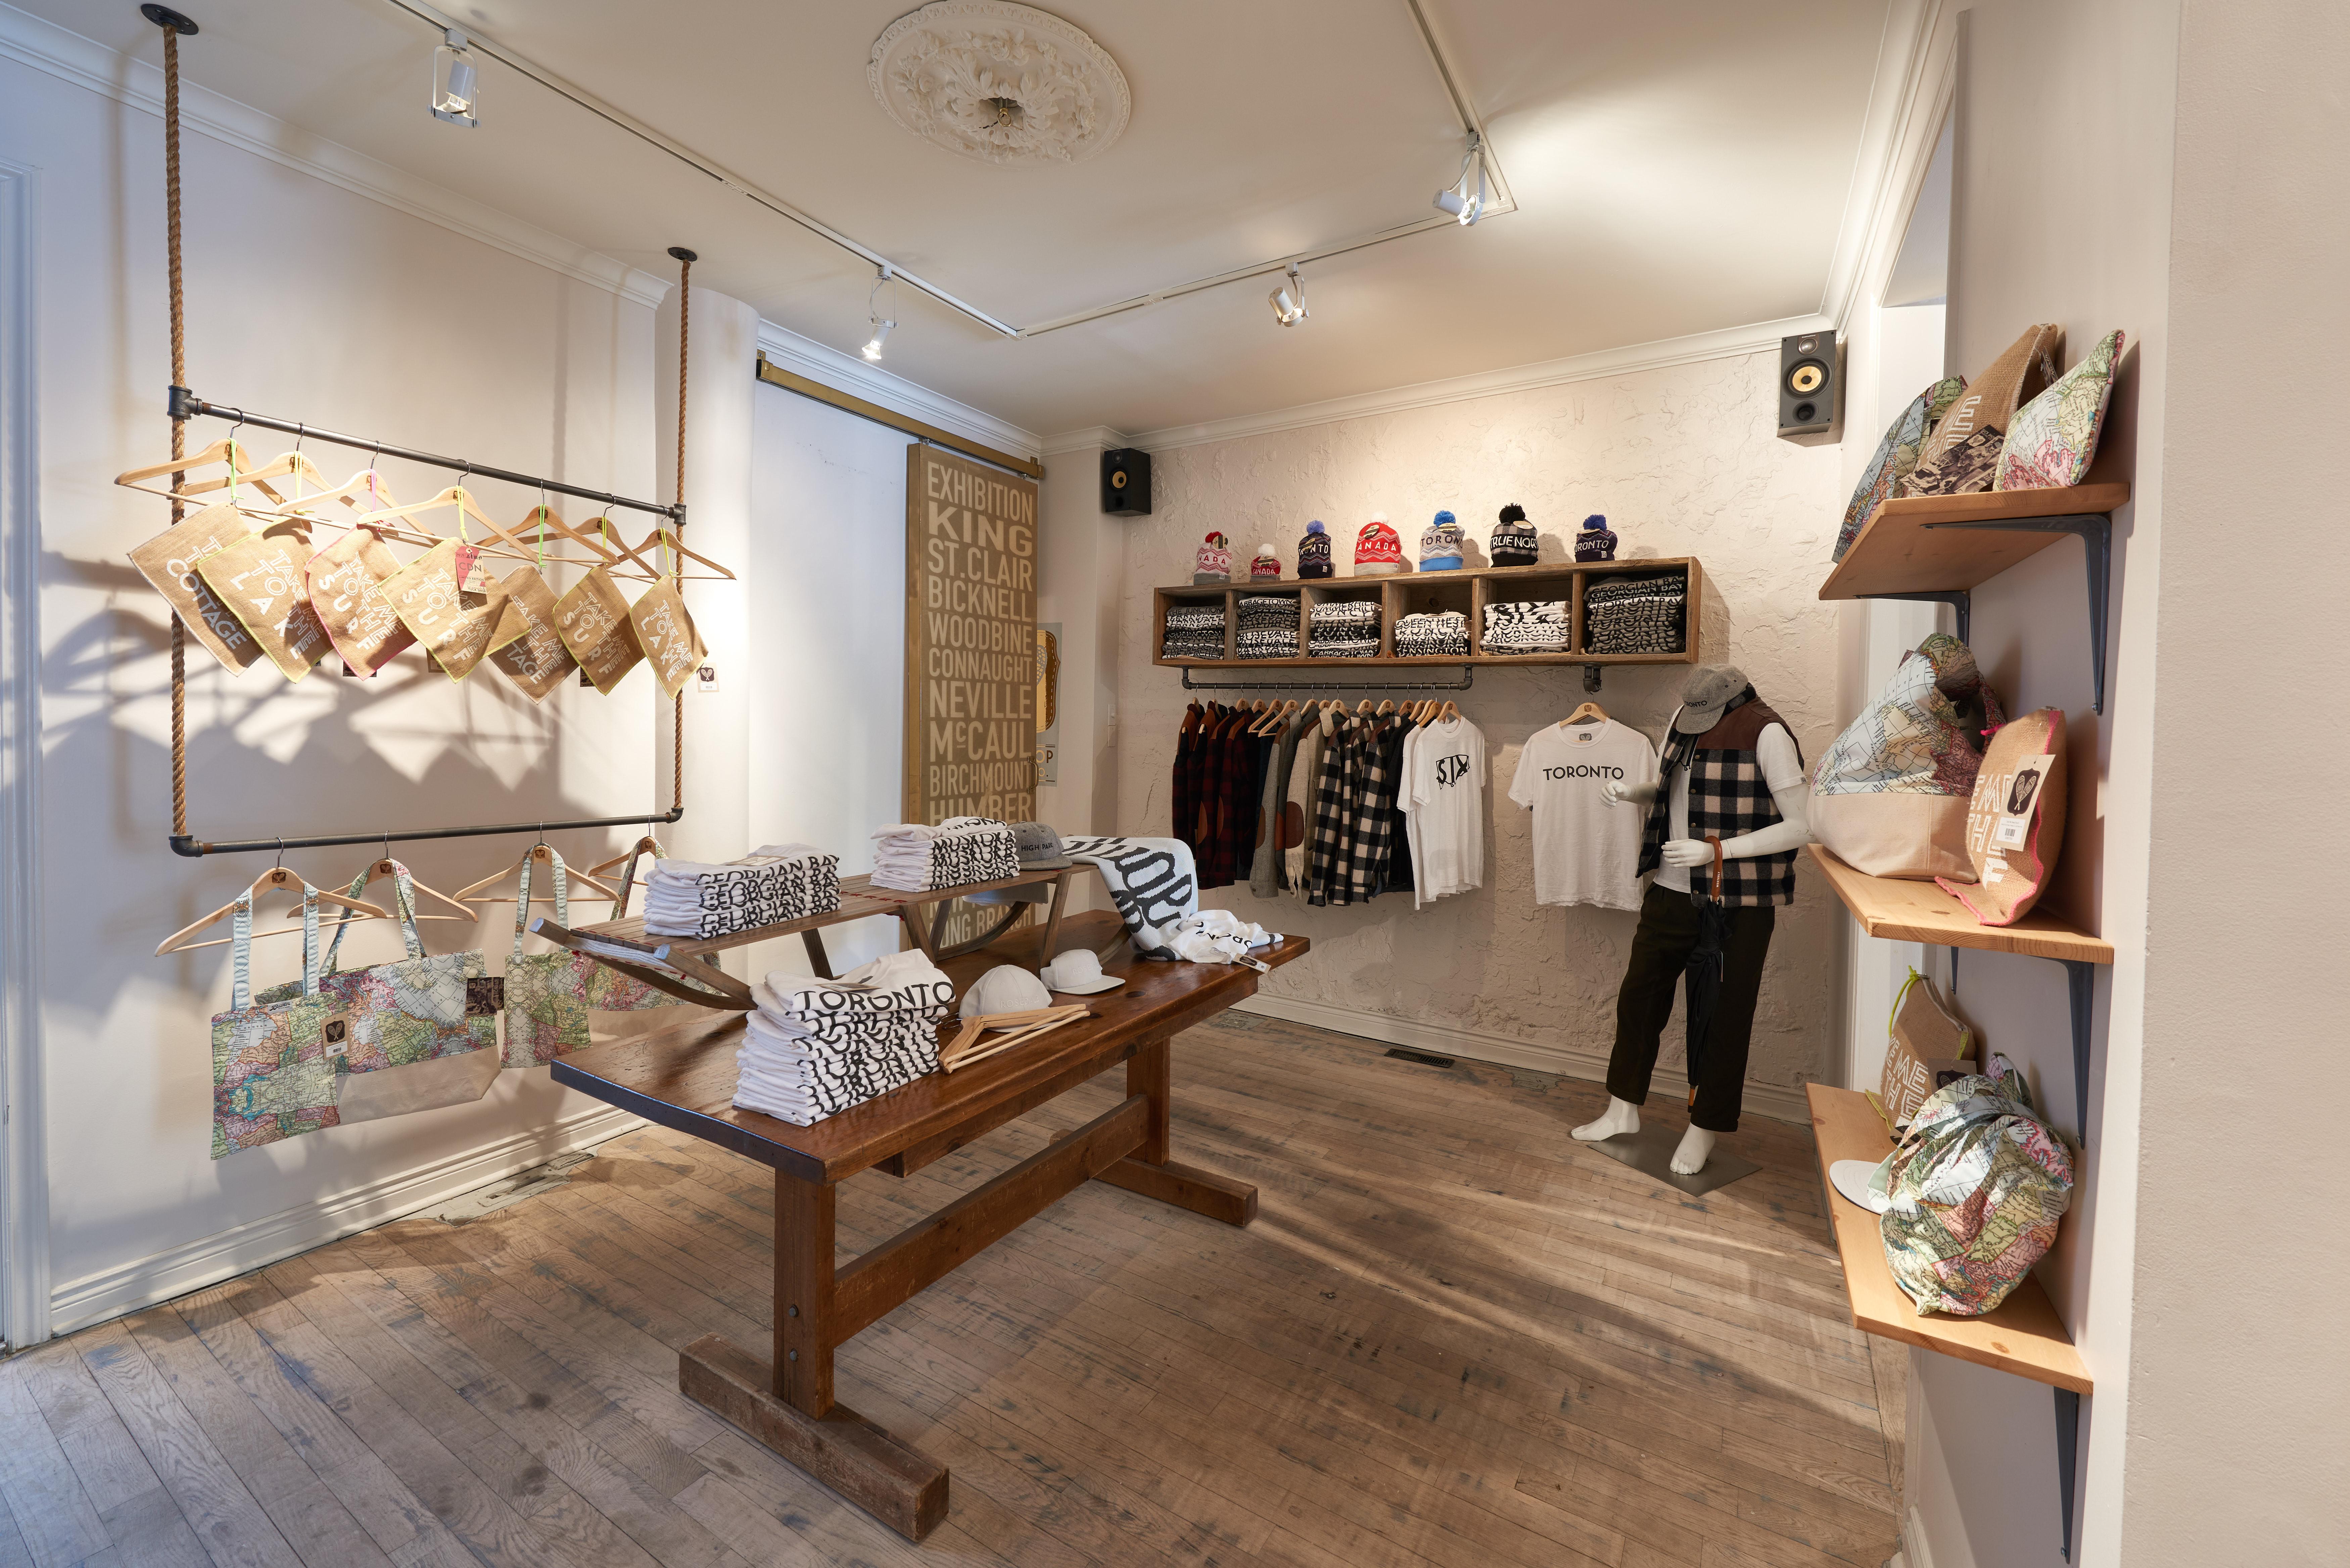 Tsc store 057